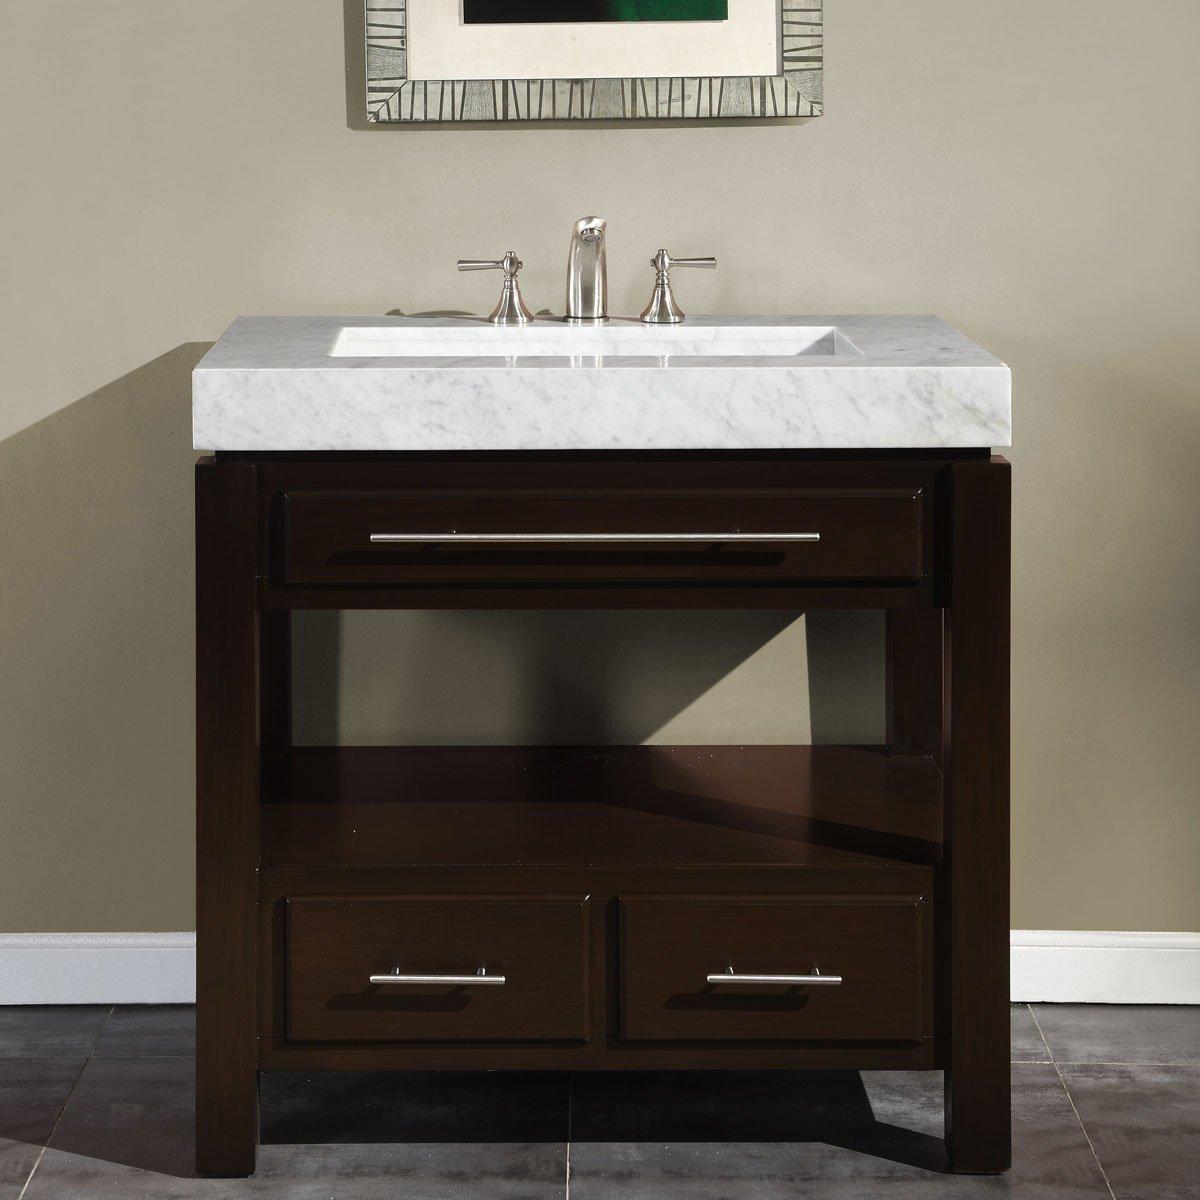 Amazon com  Silkroad Exclusive Dark Walnut Marble Stone Top Sink Cabinet Bathroom  Vanity  36 Inch  Home   Kitchen. Amazon com  Silkroad Exclusive Dark Walnut Marble Stone Top Sink